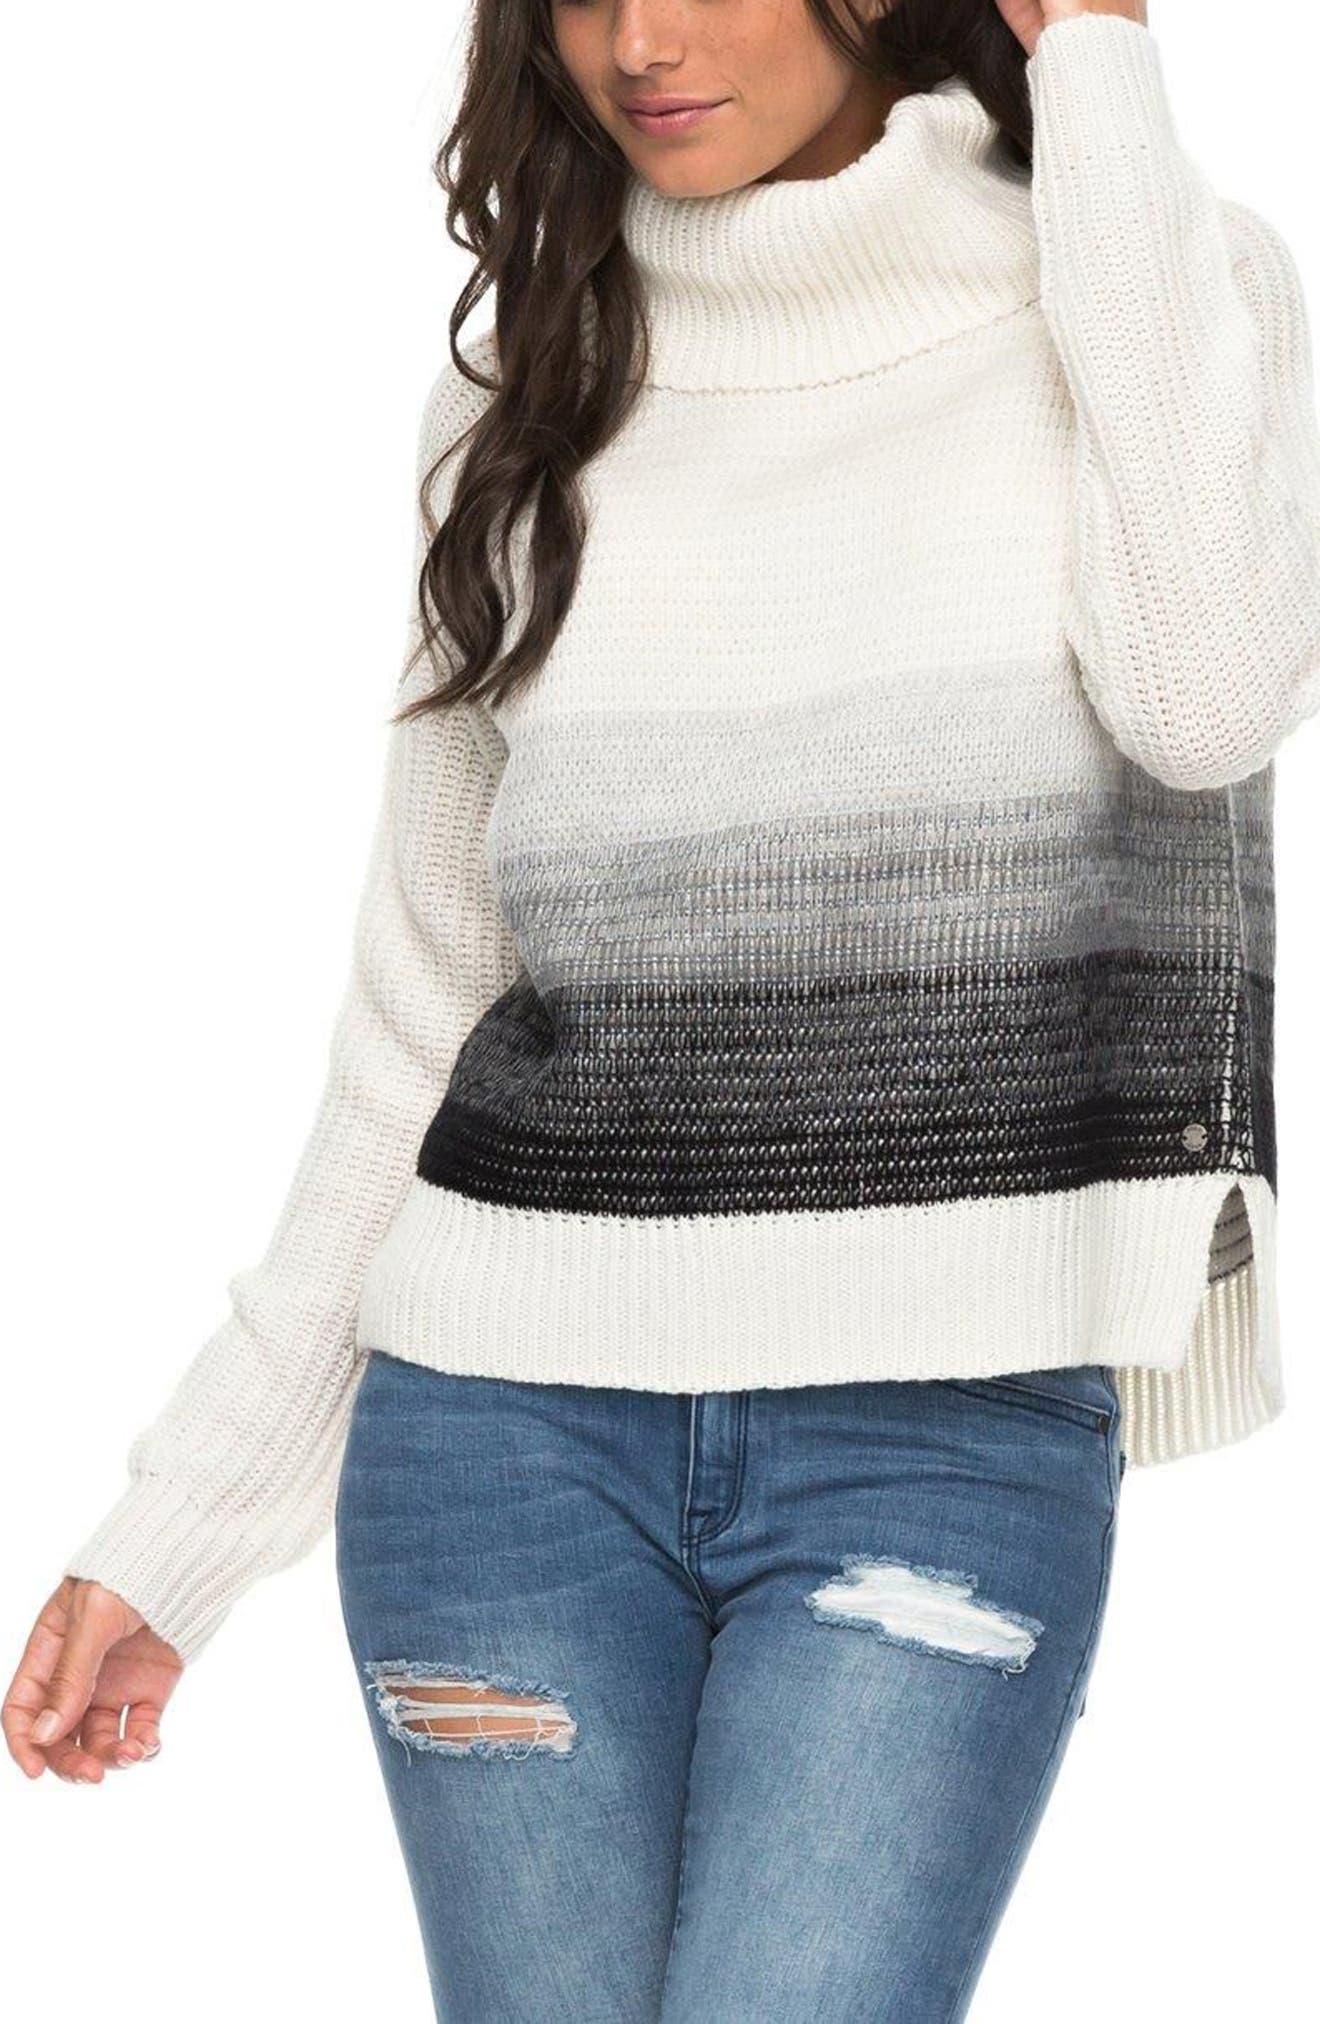 Morning Sun Sweater,                         Main,                         color, 101